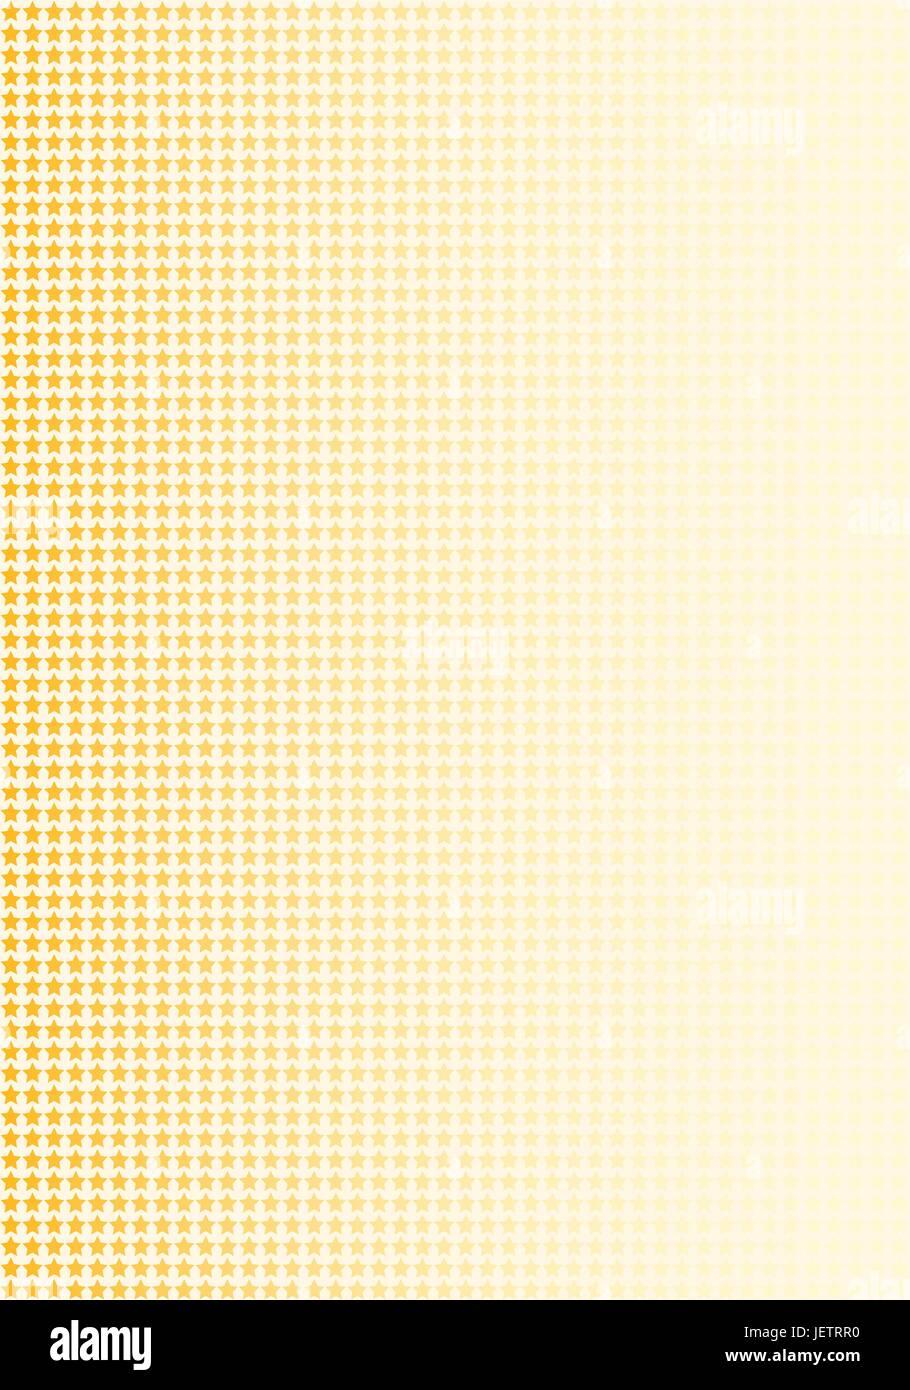 raster, orange, graphics, graphic, small, tiny, little, short, illustration, - Stock Vector